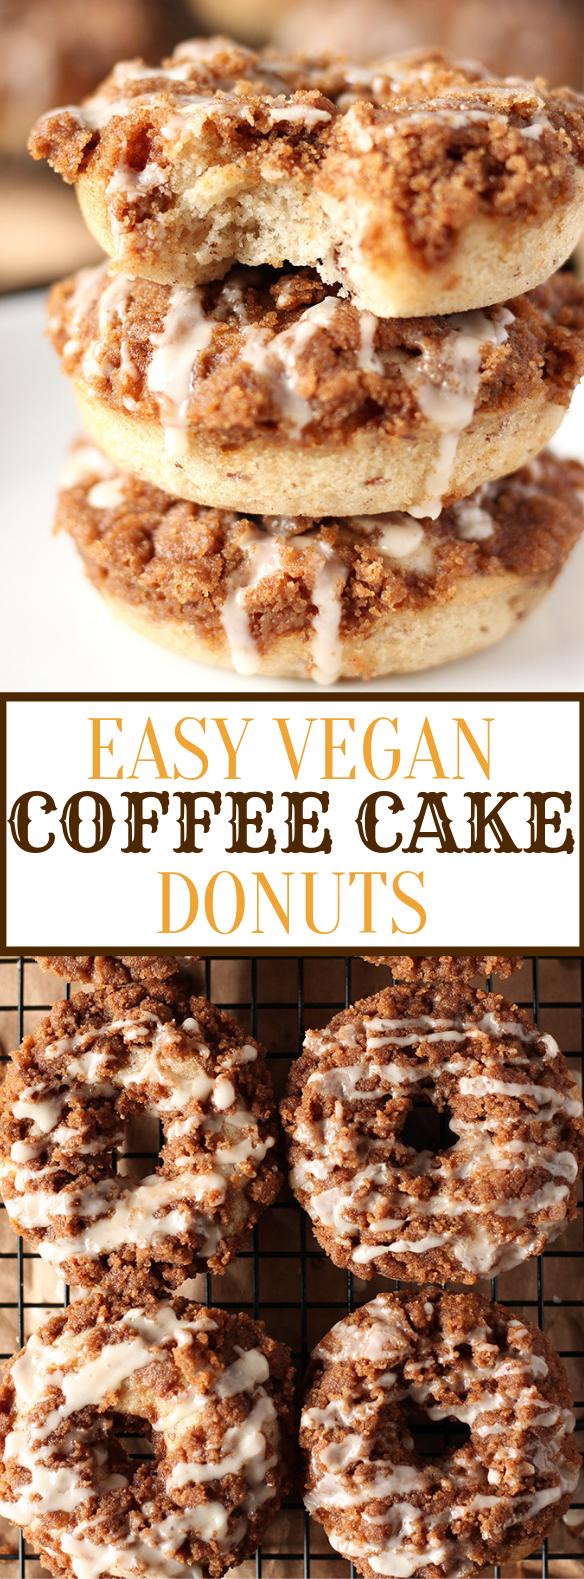 EASY VEGAN COFFEE CAKE DONUTS #veganrecipe #vegetarian